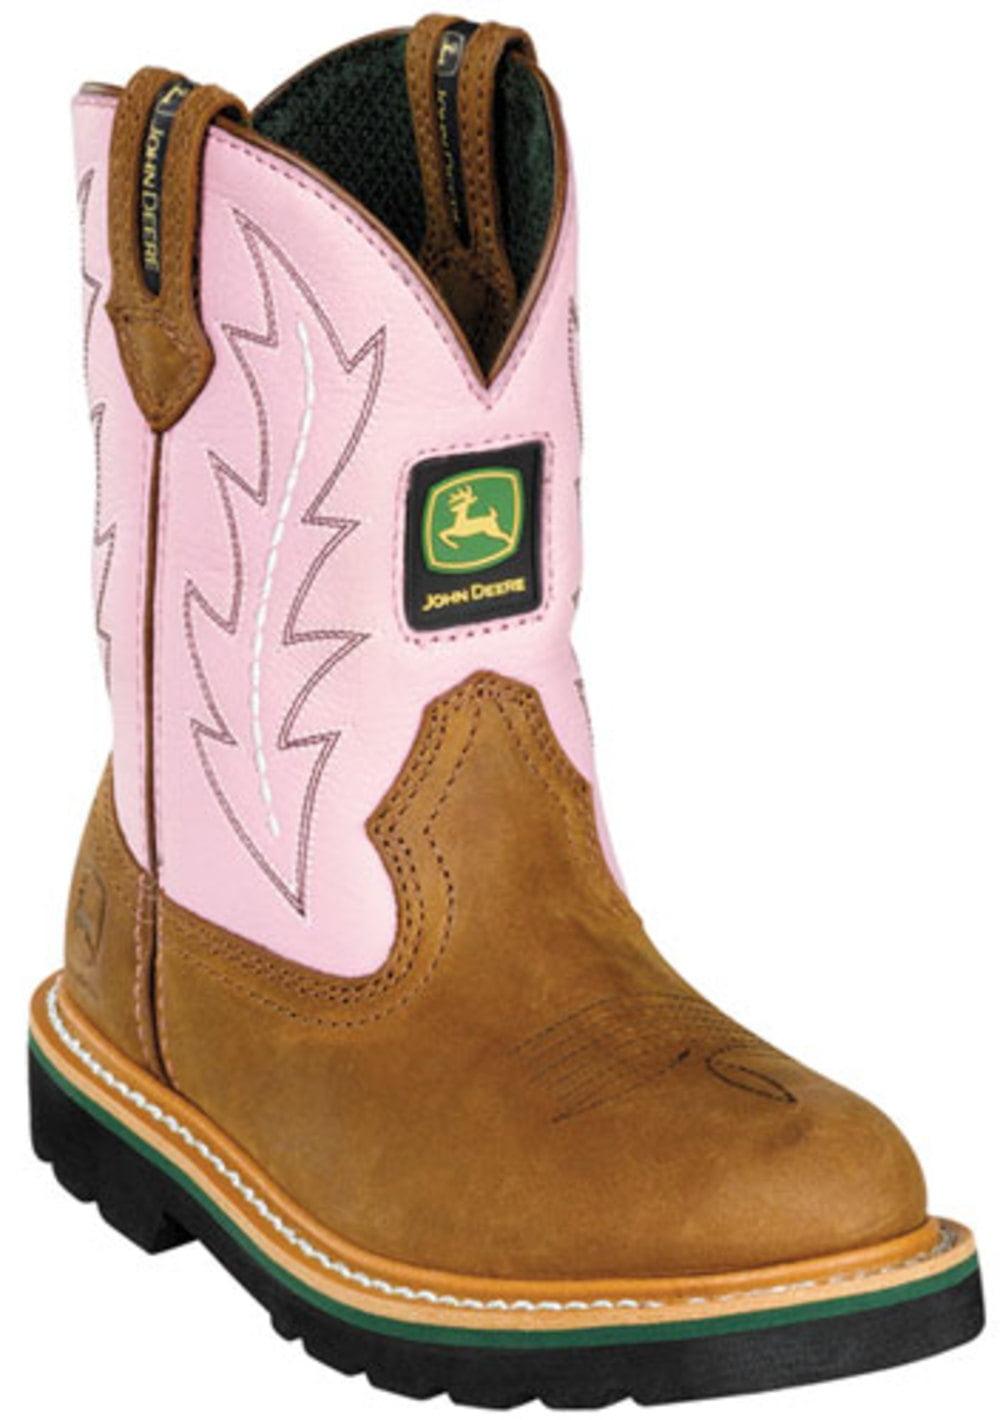 John Deere Kid's Boots Tan Pink 1.5 W by